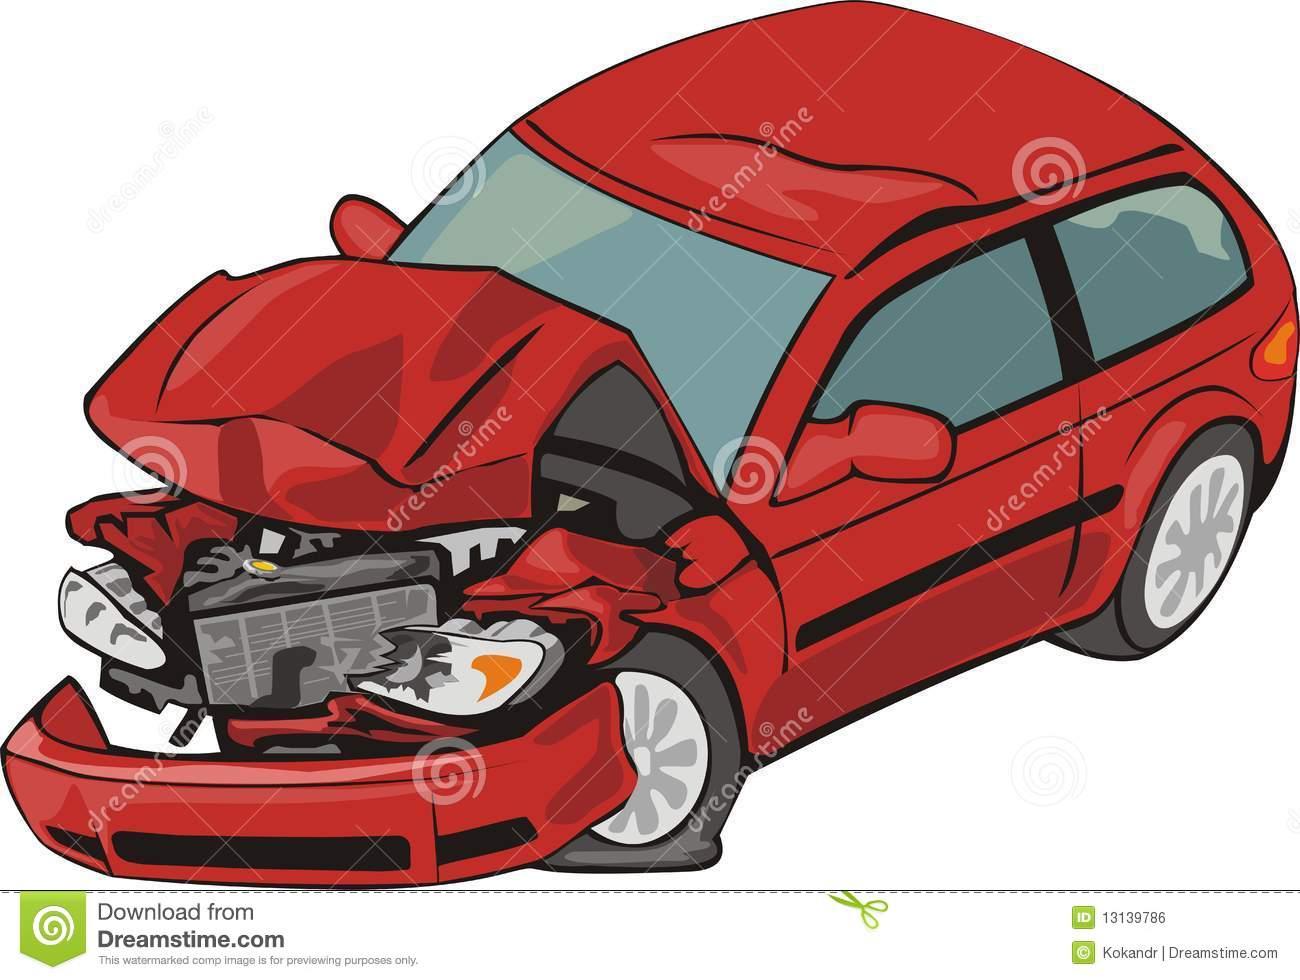 Crash car stock vector. Illustration of damage, front.